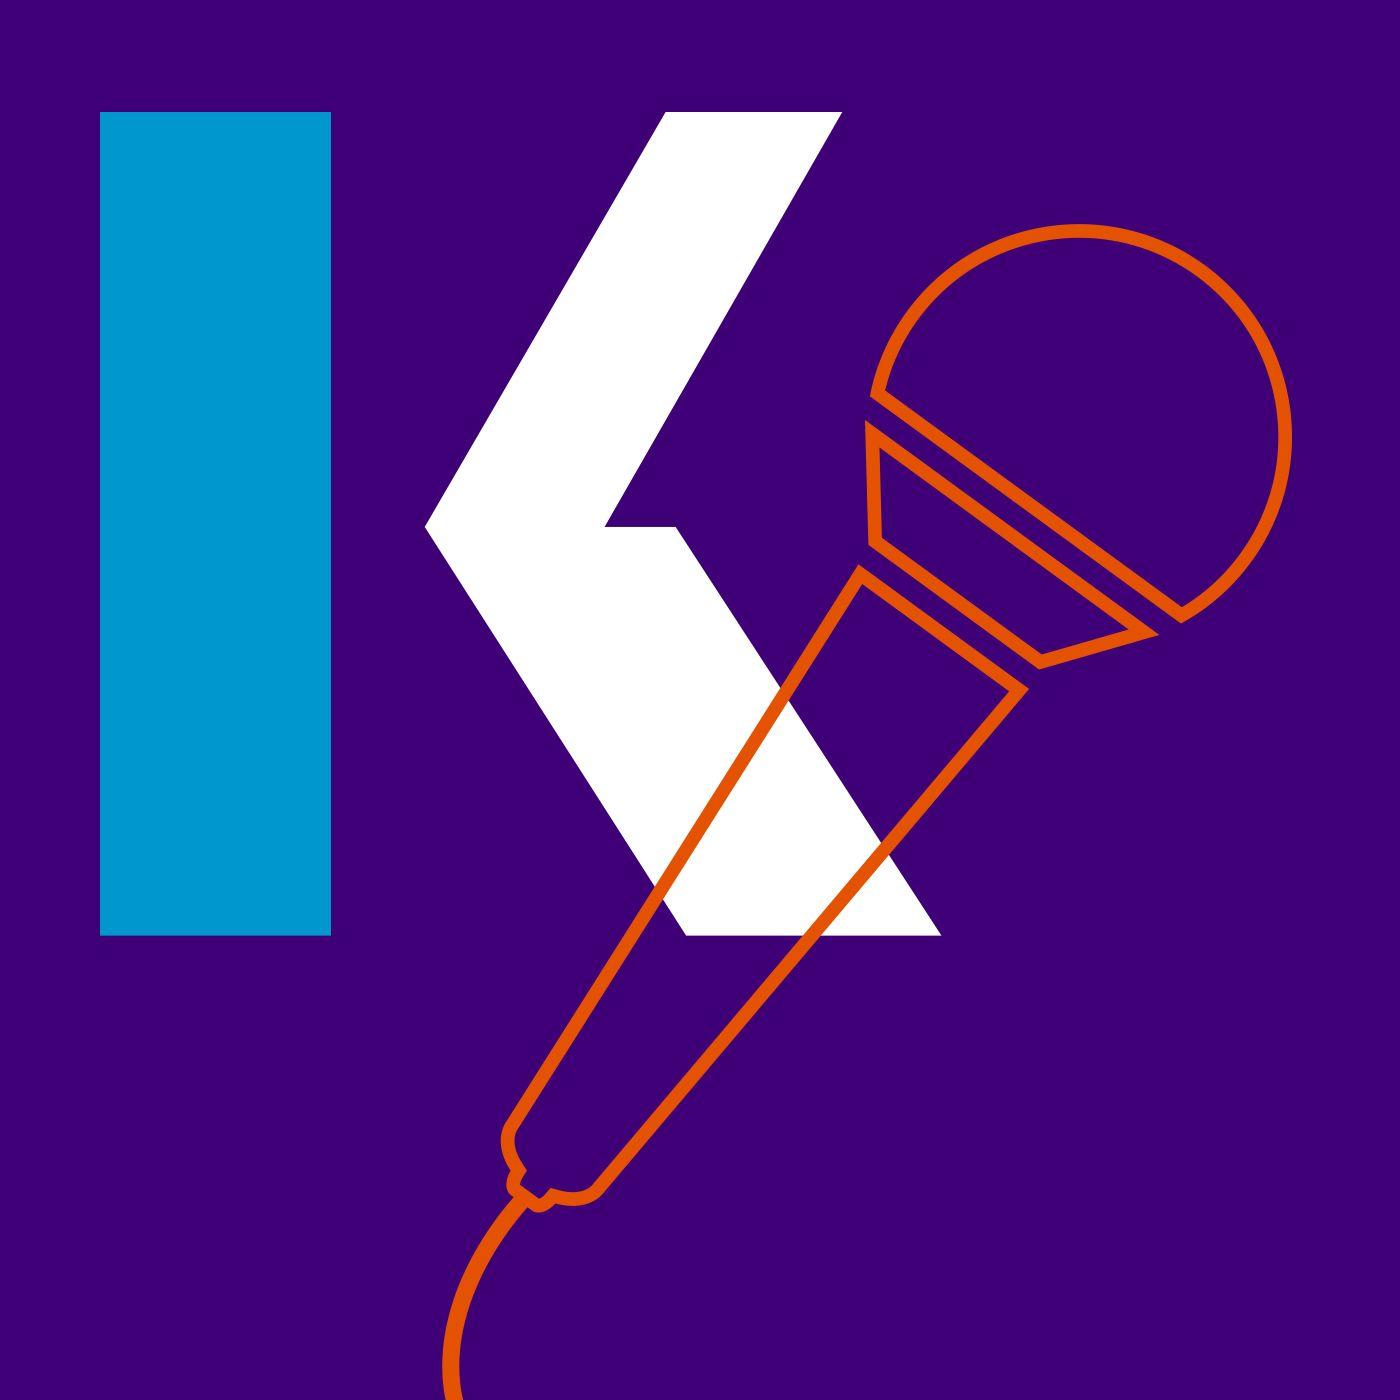 Kaplan's NCLEX Prepcast - Episode 23 - NCLEX®Test Plan